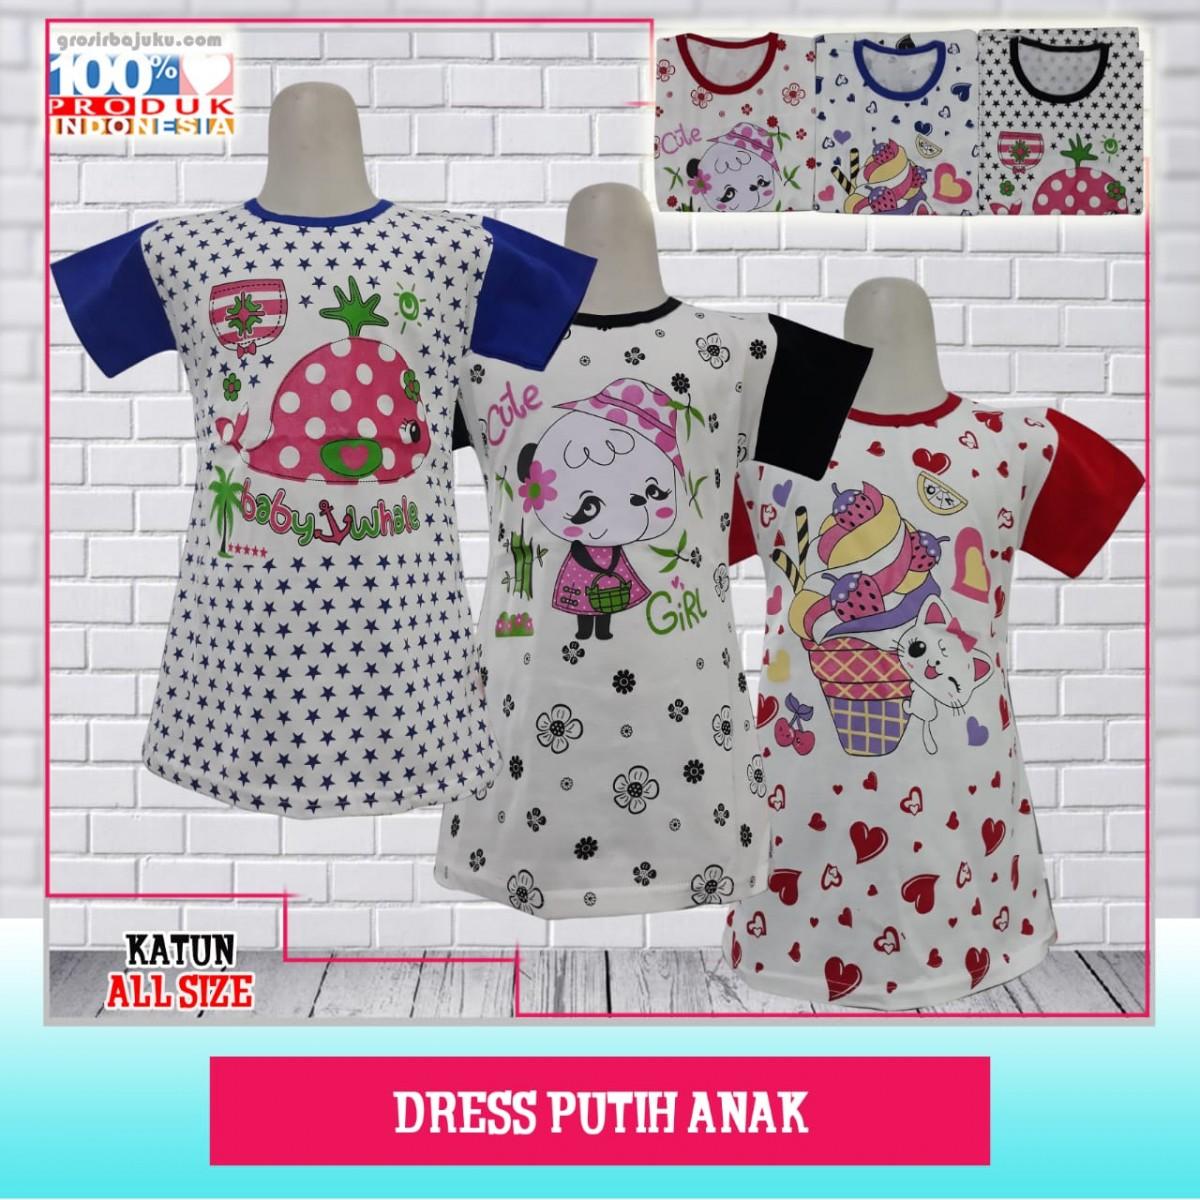 ObralanBaju.com Dress Putih Anak Murah